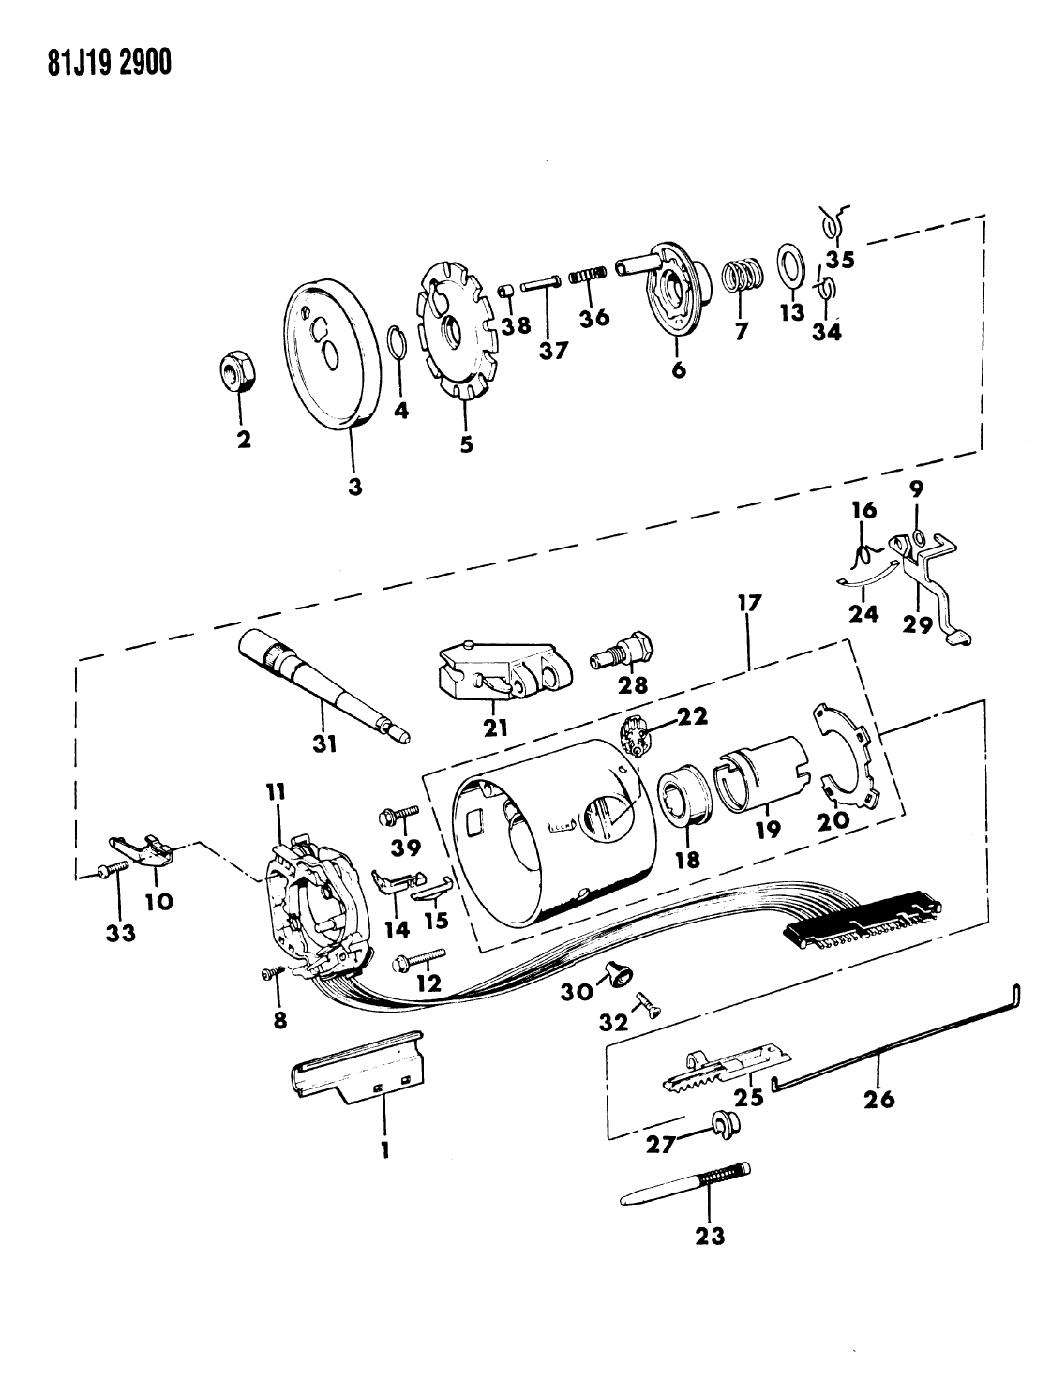 1985 Jeep J20 Housing - Steering Column Upper - Mopar Parts